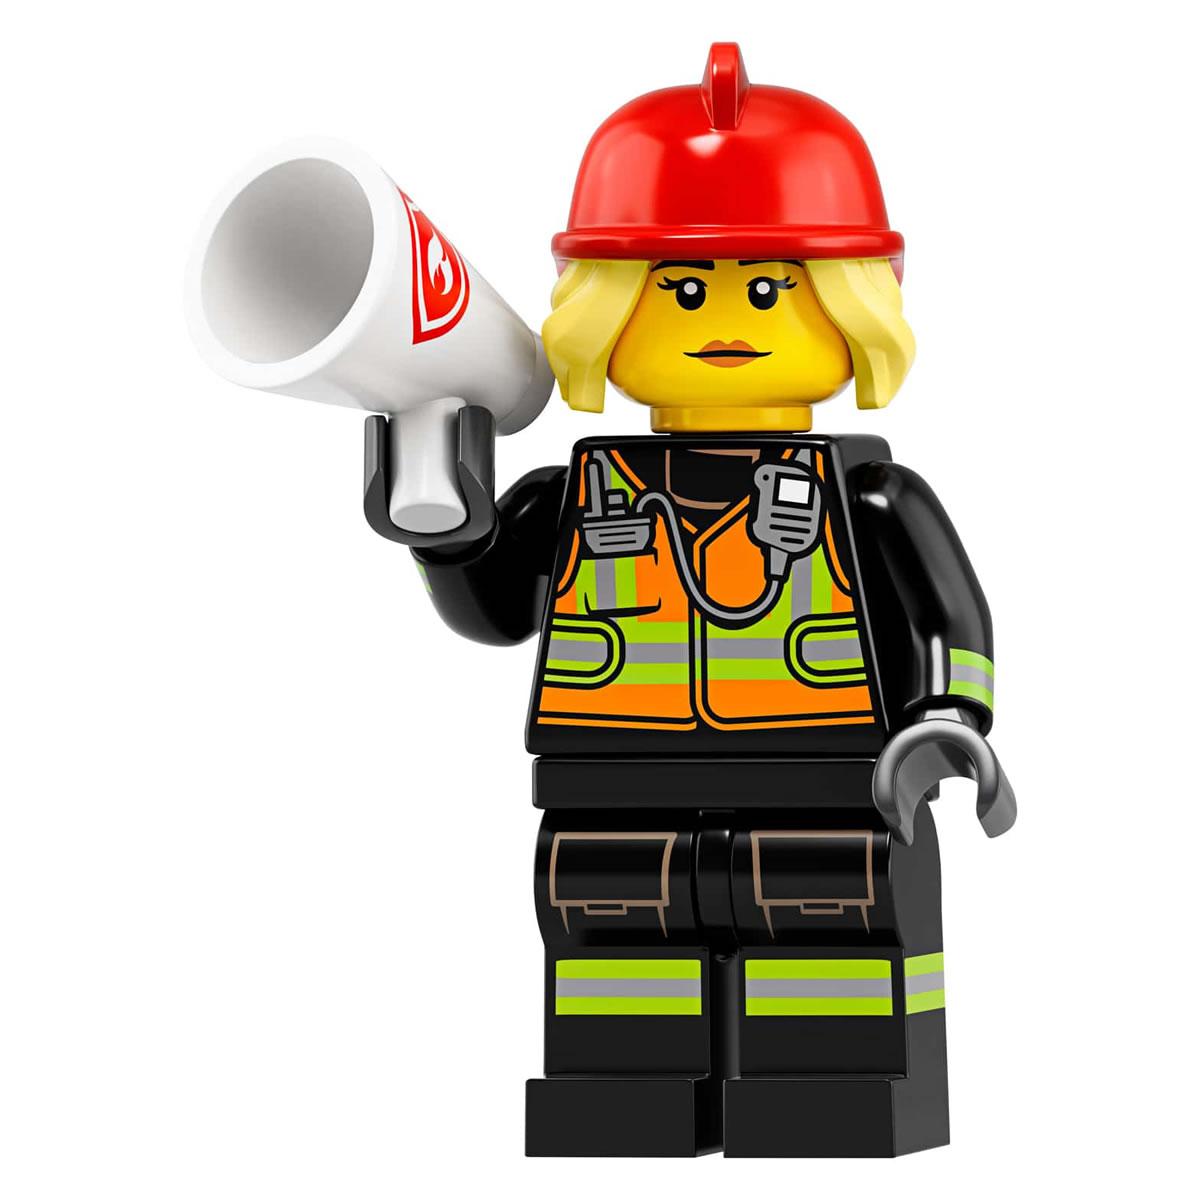 lego-minifiguren-sammelserie-collectible-minifigures-serie-19-71025-2019-10 zusammengebaut.com